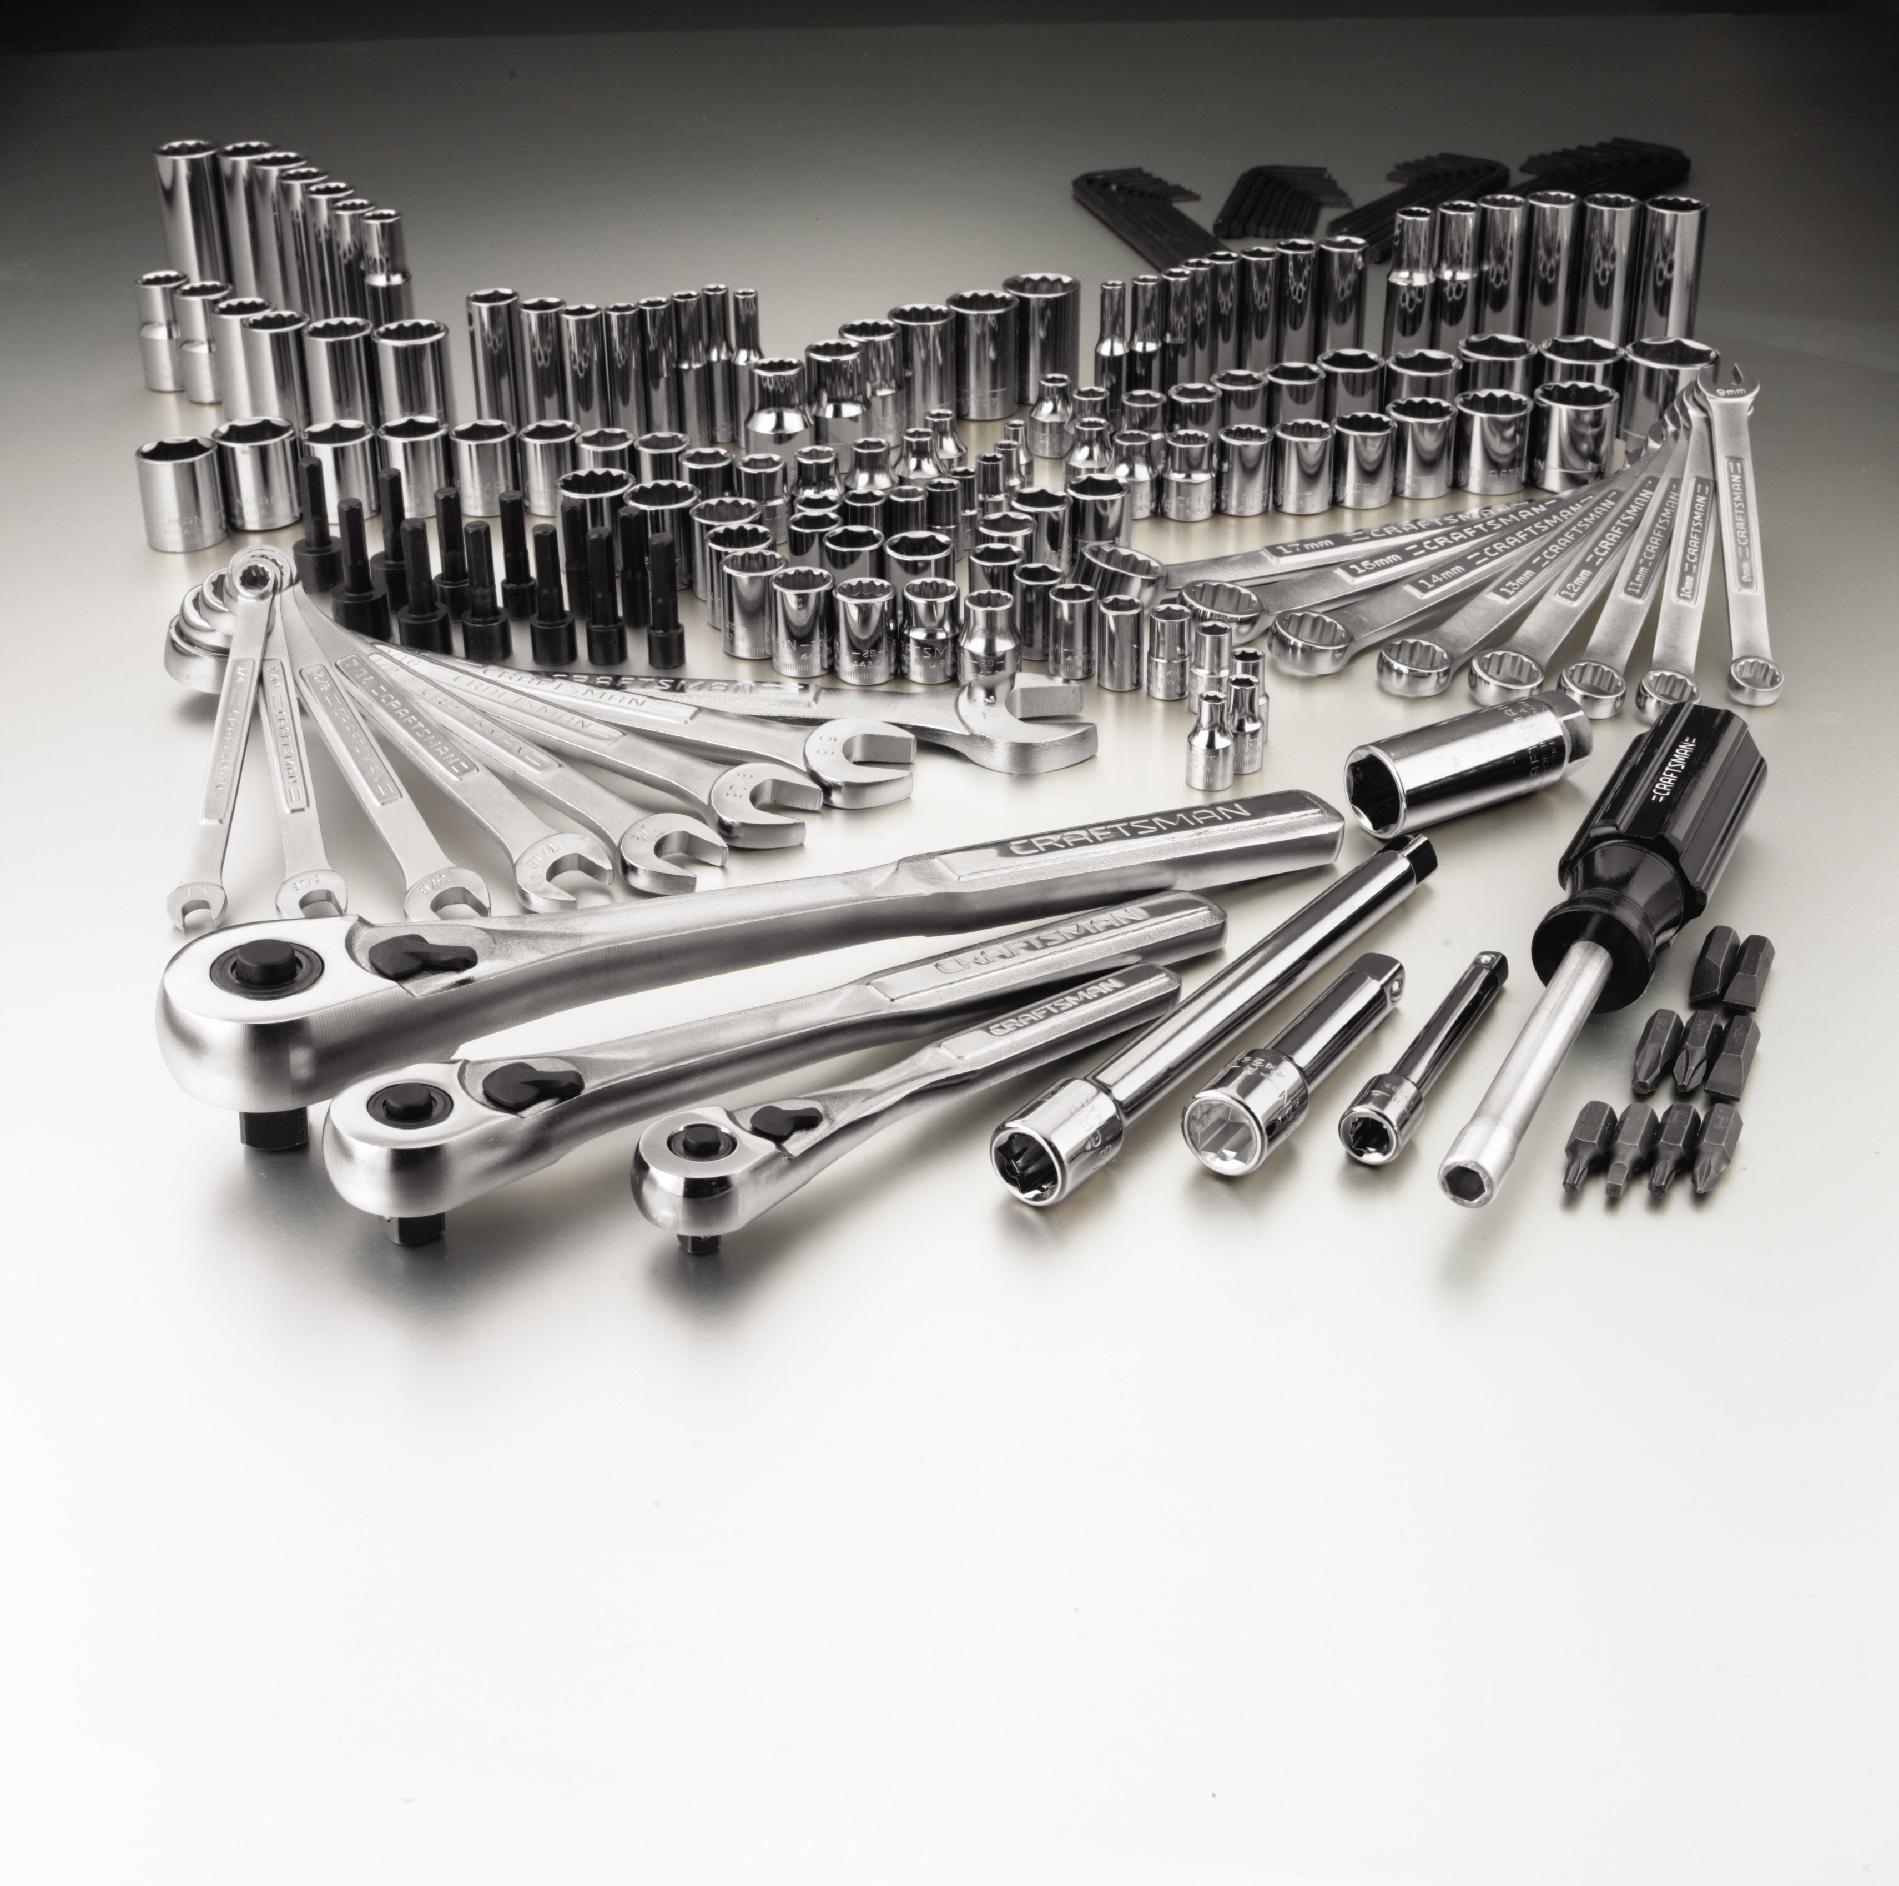 Craftsman 192 pc. Mechanics Tool Set with Trifold Case